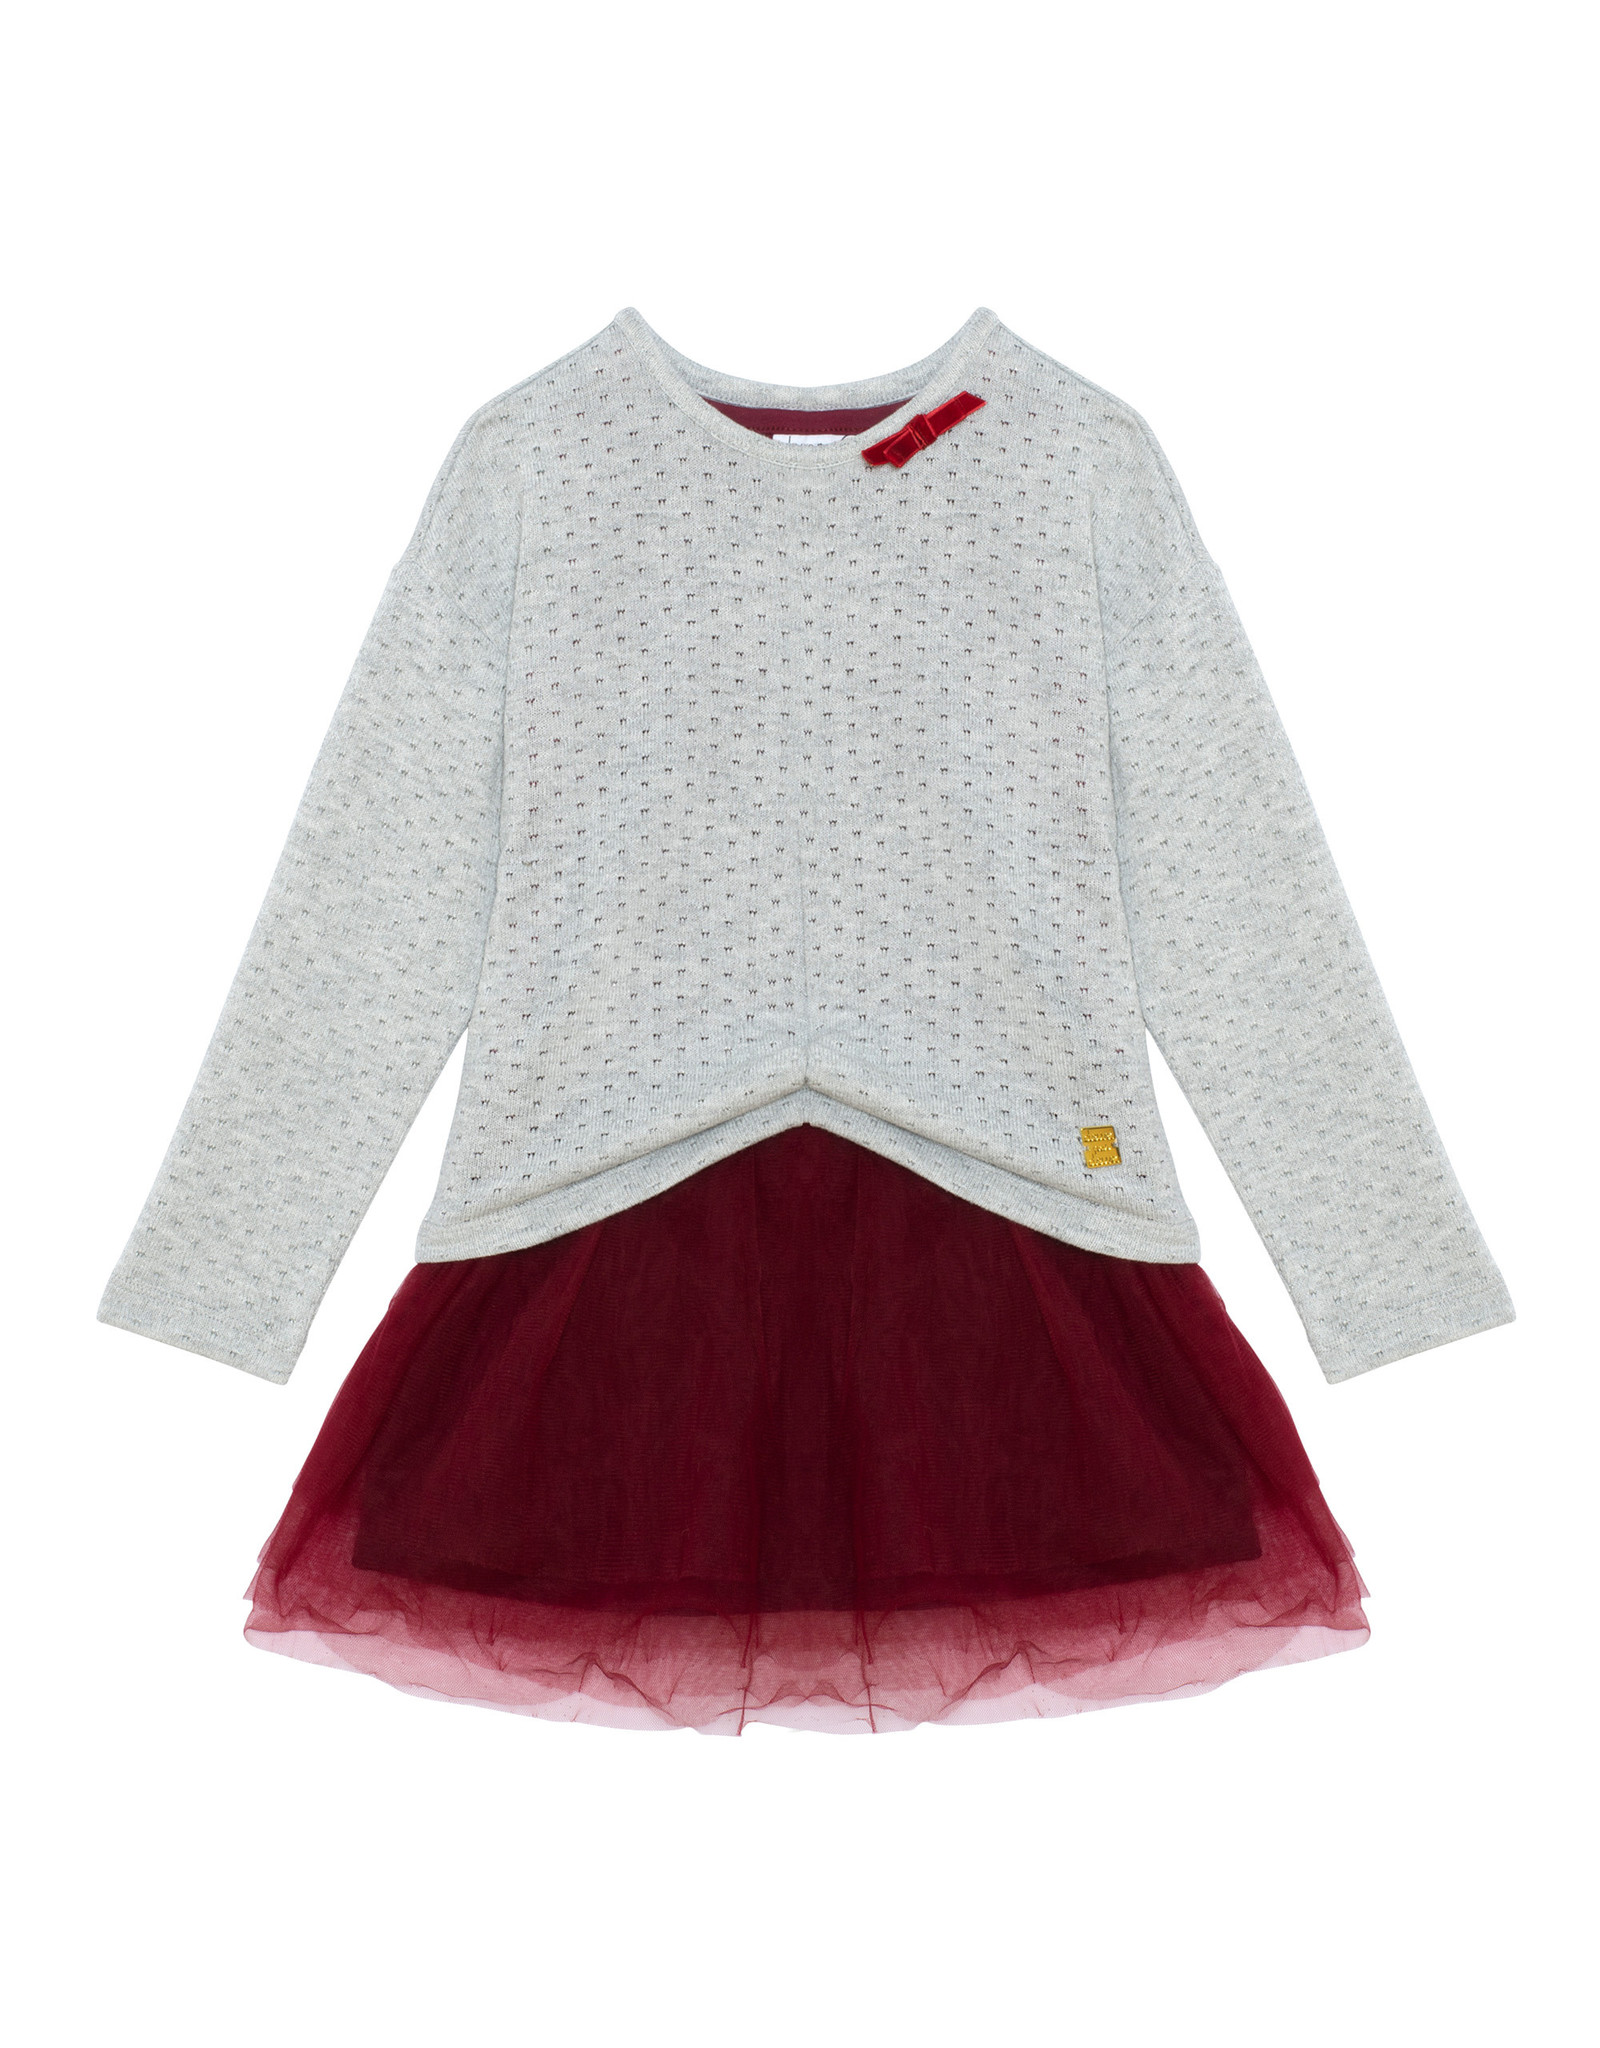 Deux Par Deux Grey 2 in 1 Holiday Dress w/Sweater